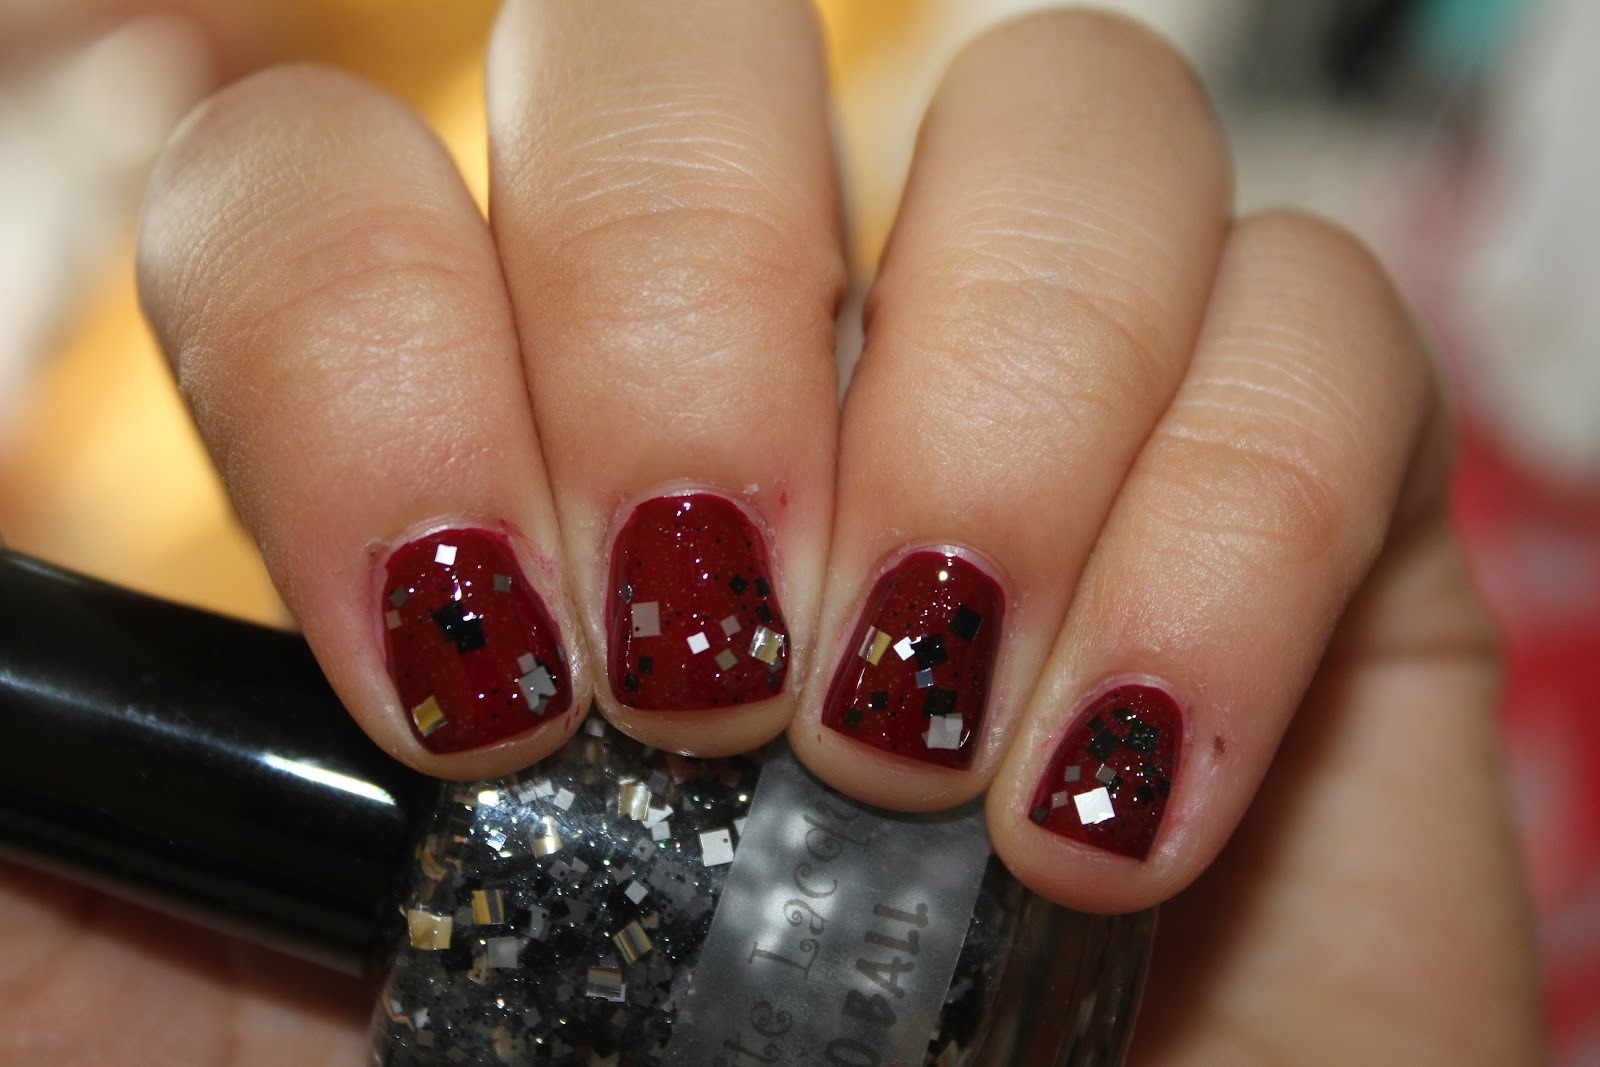 Essie + Essie® Nail Polish in Berry Naughty - refinery29.com